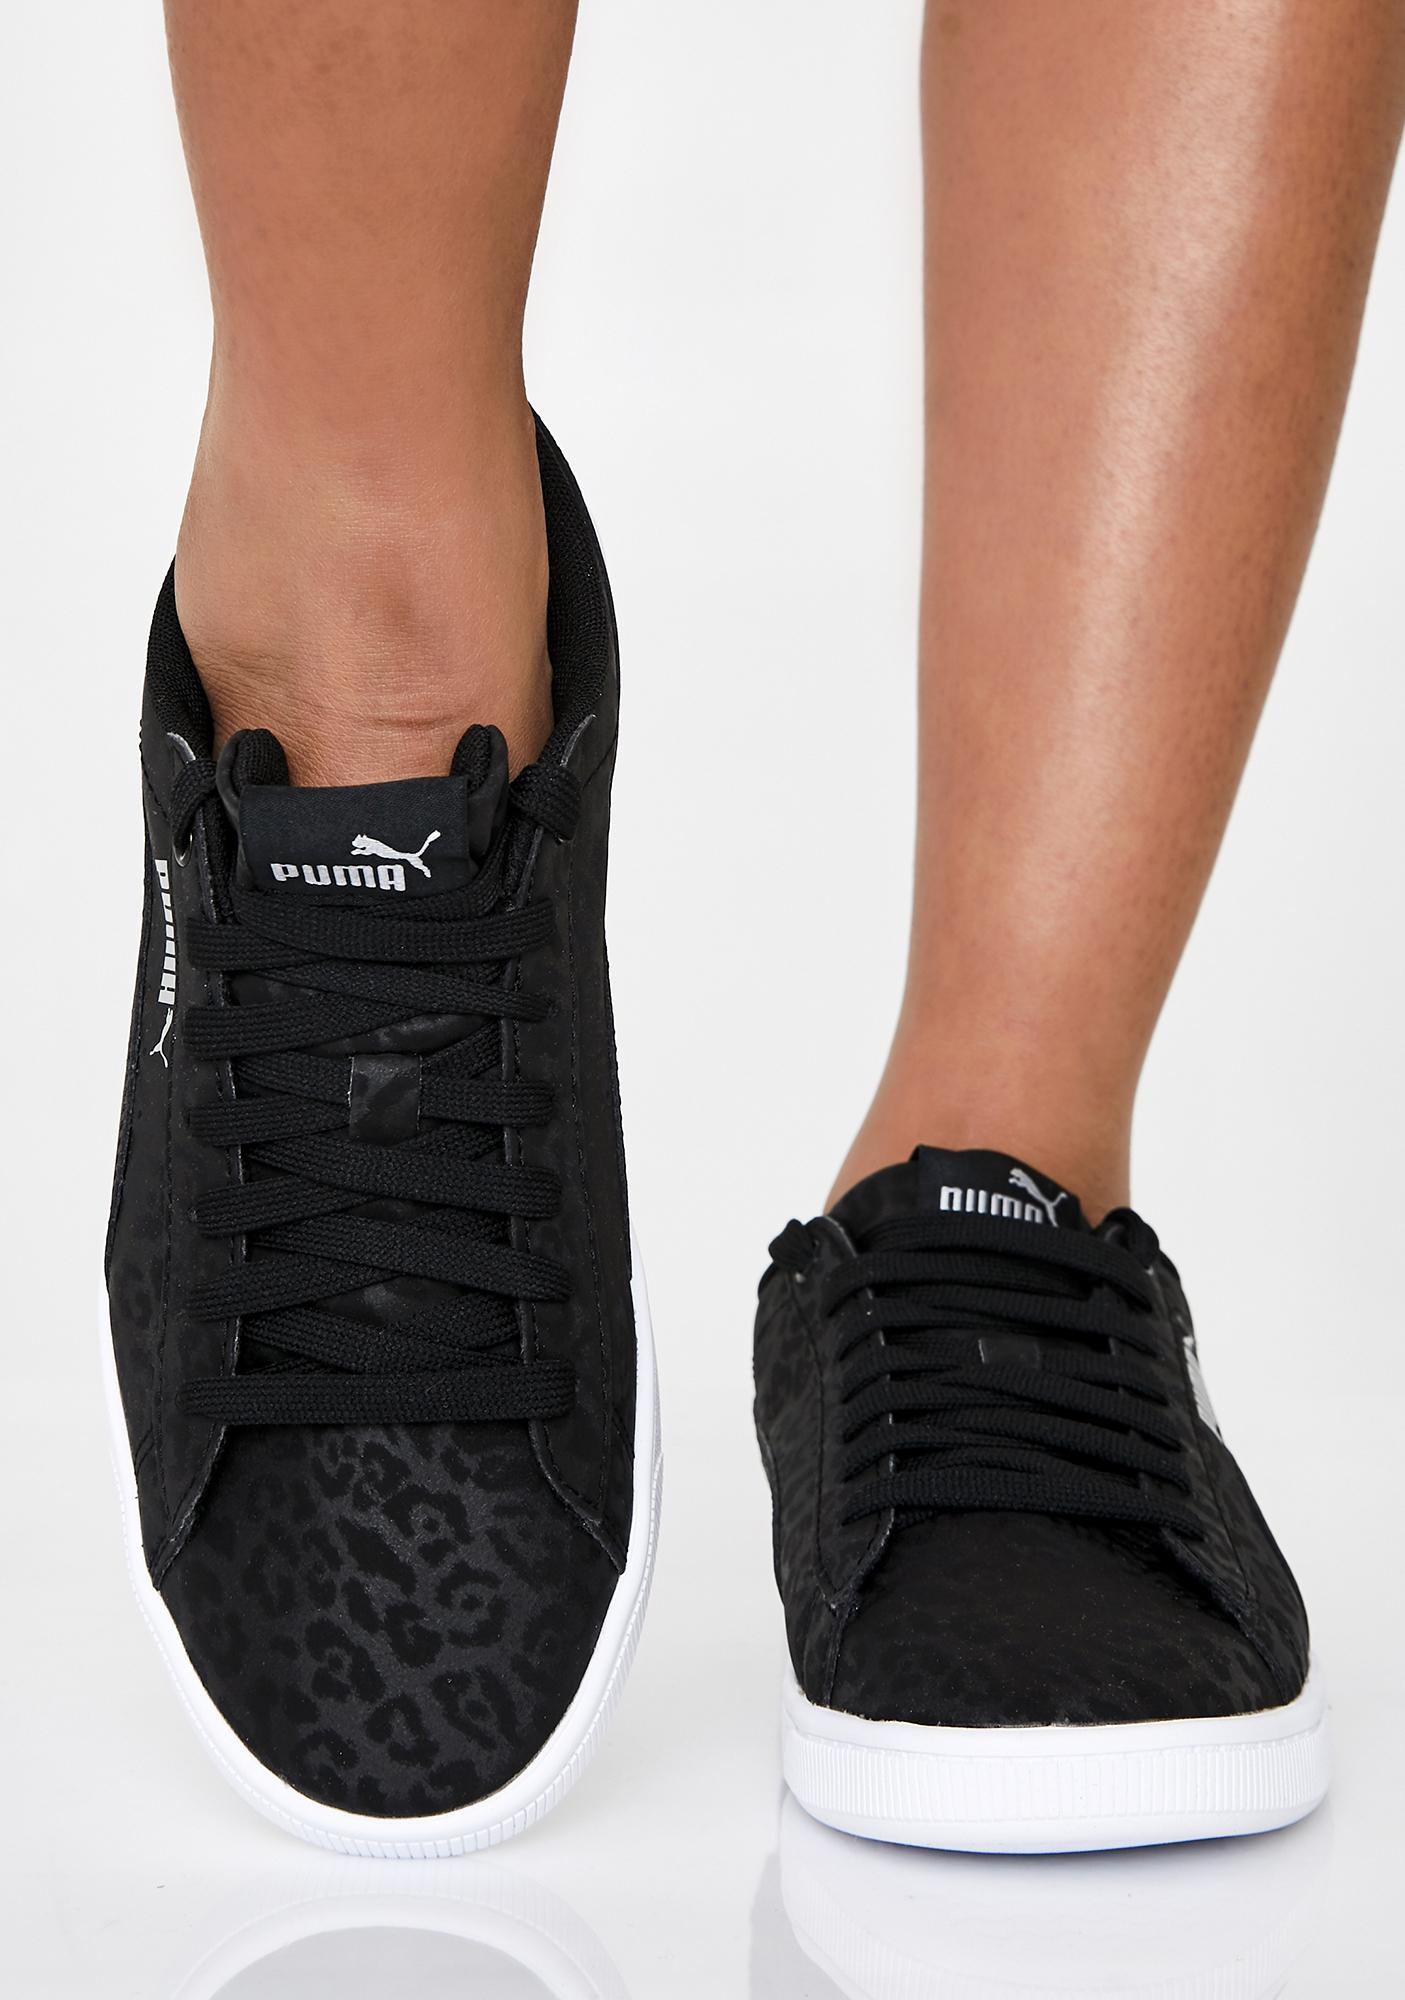 PUMA Vikky V2 Wildcat Sneakers